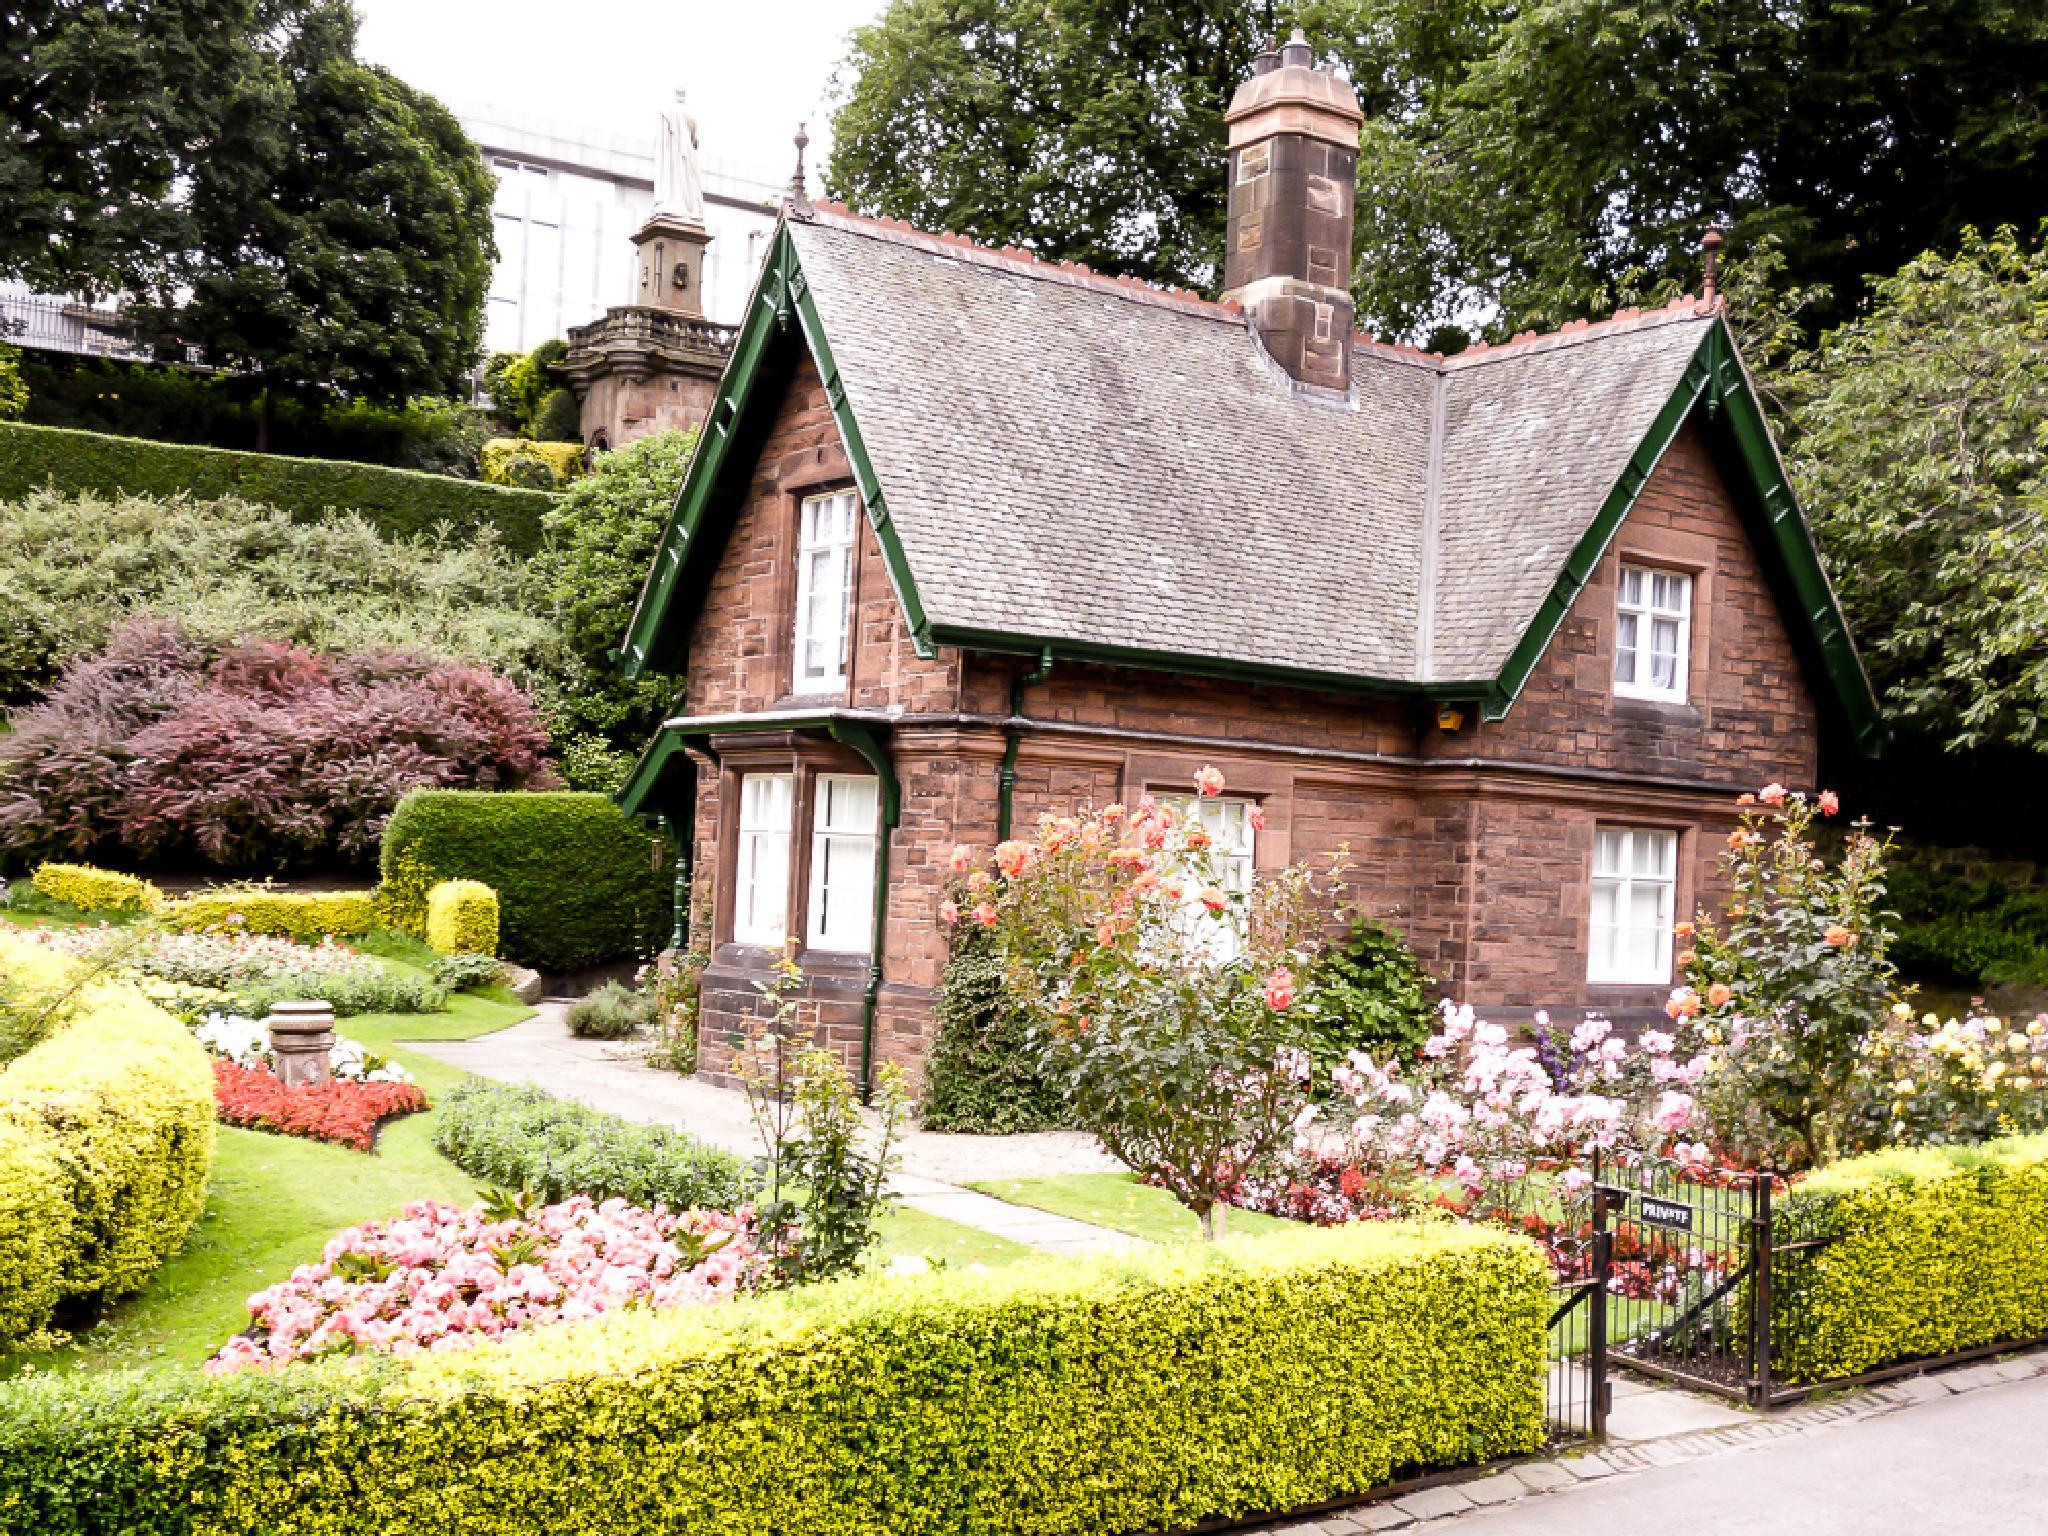 Ground Keepers Cottage, Princes Street Gardens, Edinburgh by bob.cunningham.56884